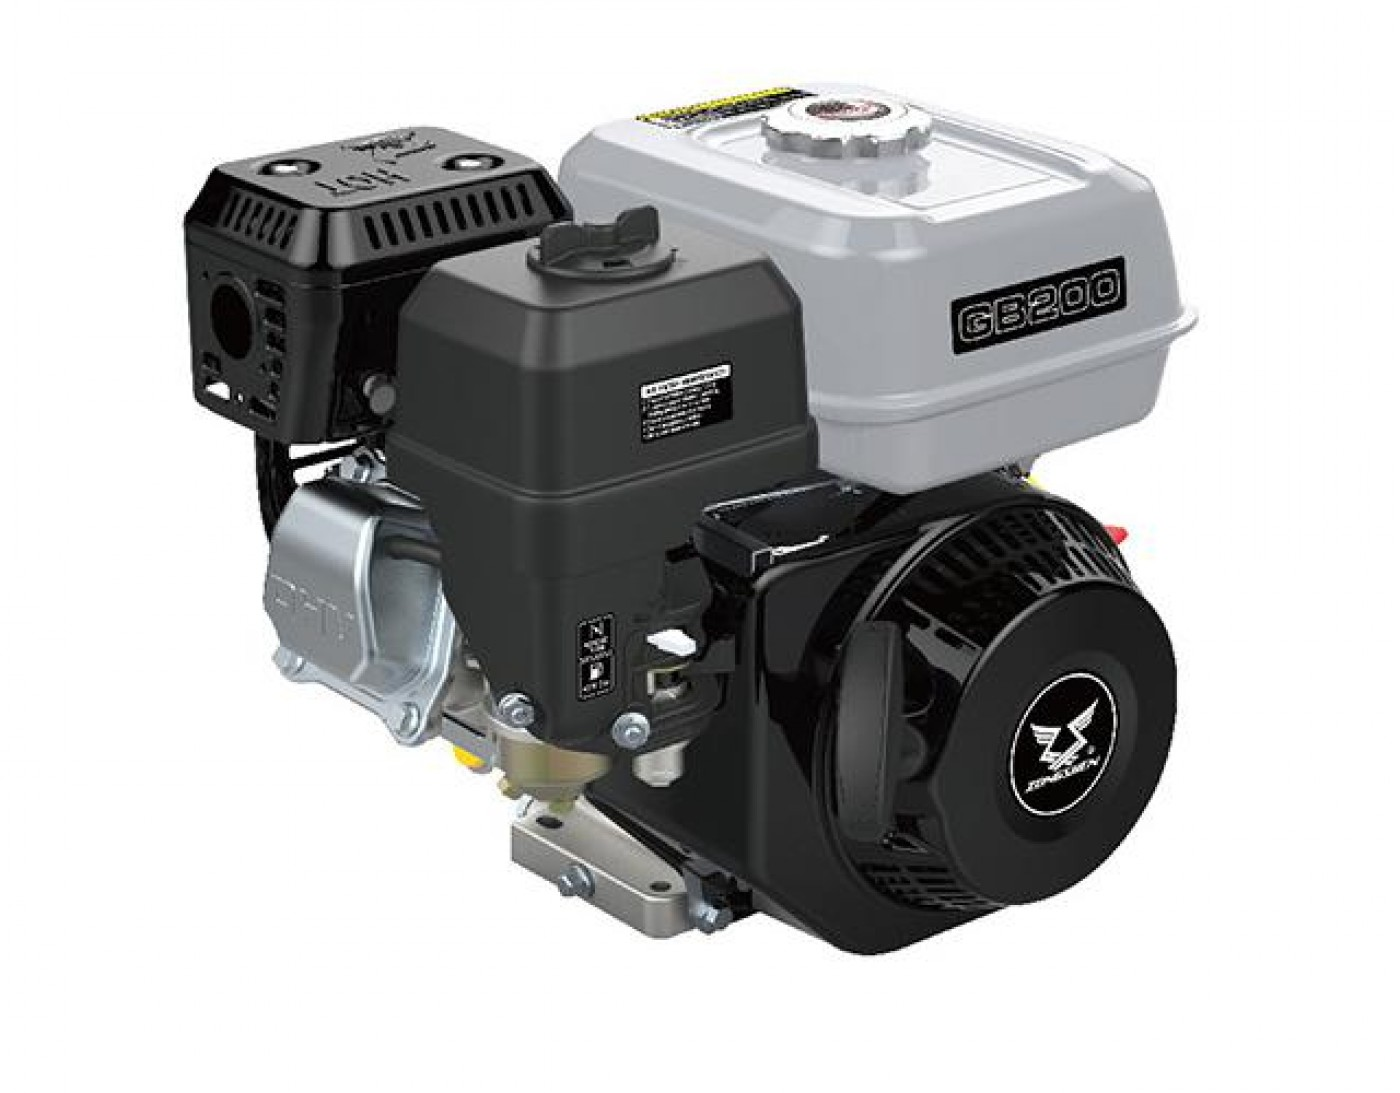 Motor ZONGSHEN GB200 196cc 6,5 HŘÍDEL 20mm